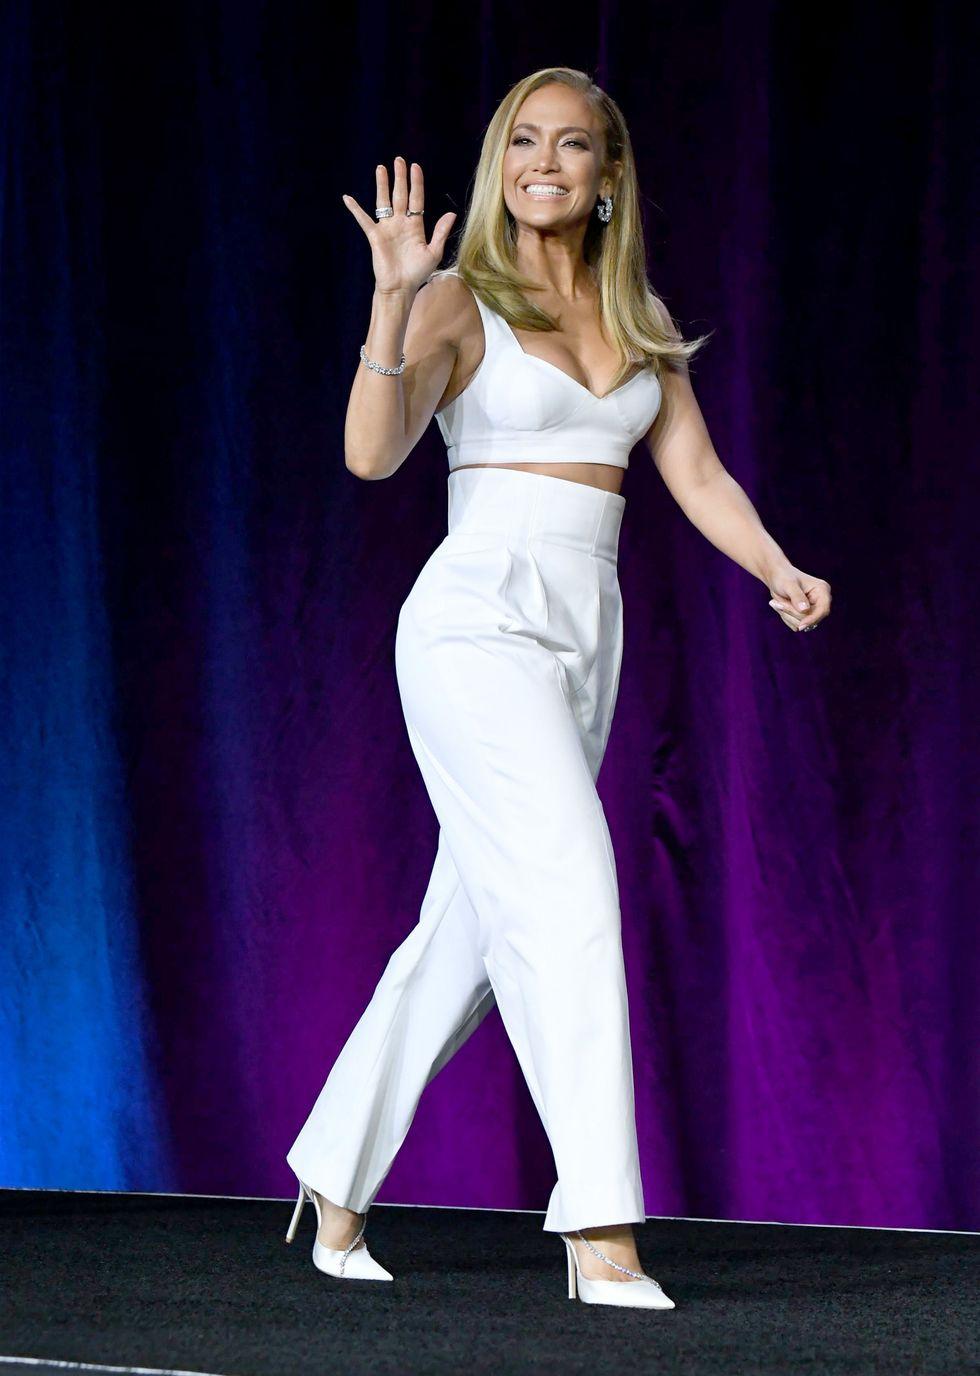 Jennifer Lopez Terlihat Bugar & Seksi di Presscon Super Bowl